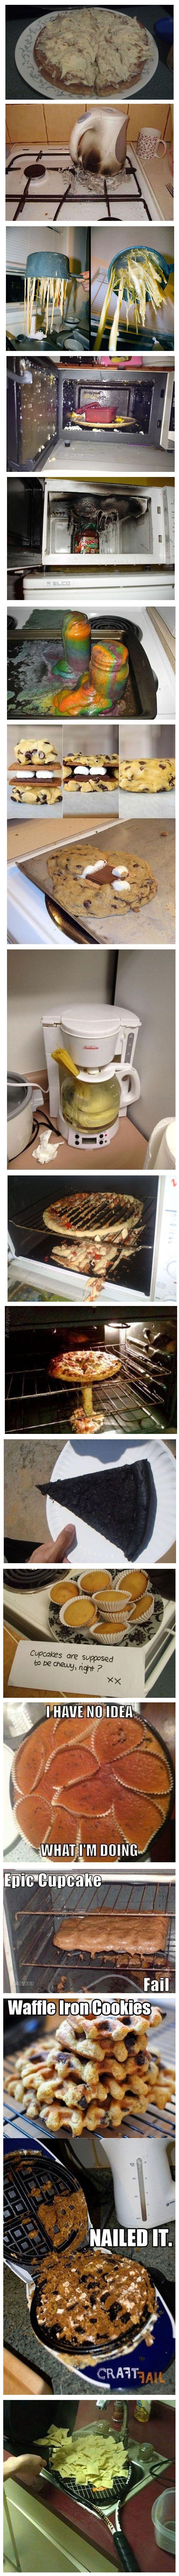 The worst cooks